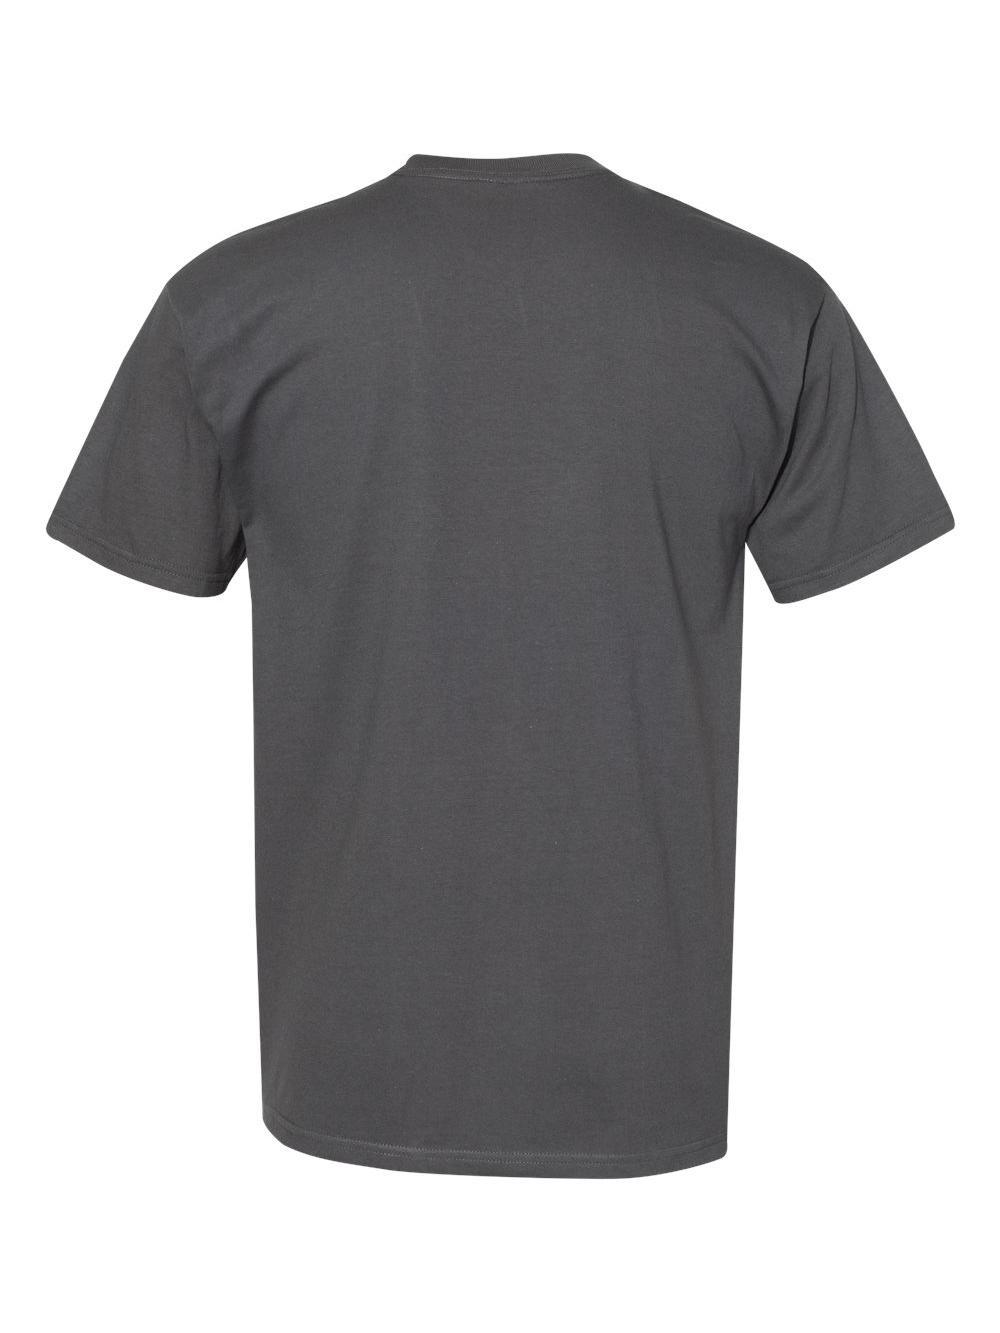 ALSTYLE-Premium-T-Shirt-1701 thumbnail 25